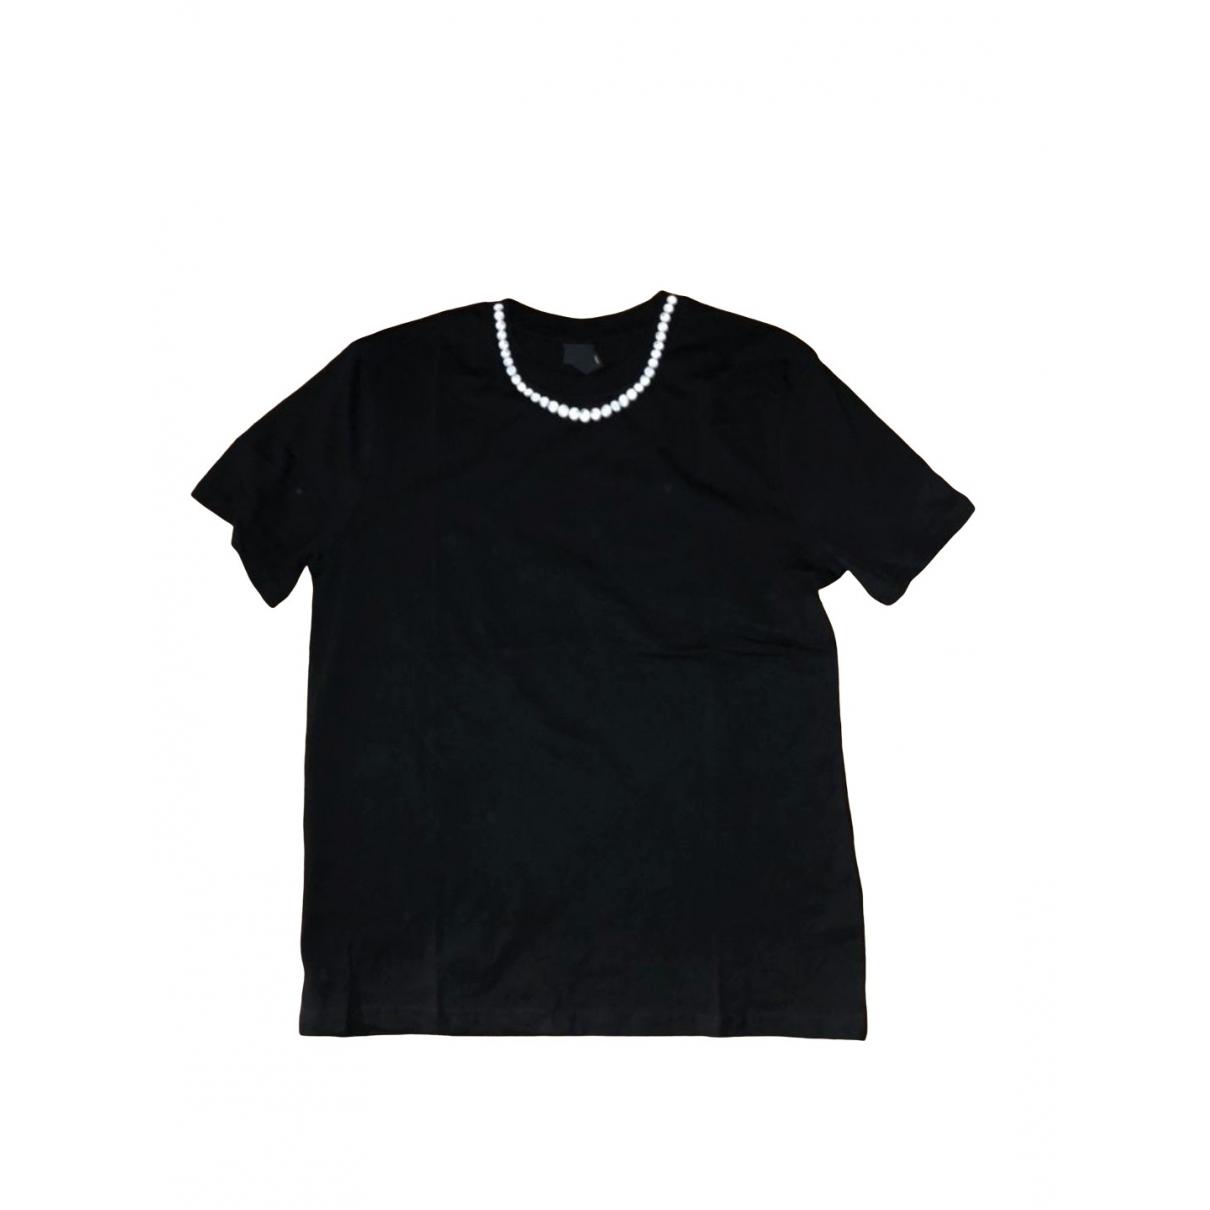 Giambattista Valli X H&m \N Black  top for Women M International